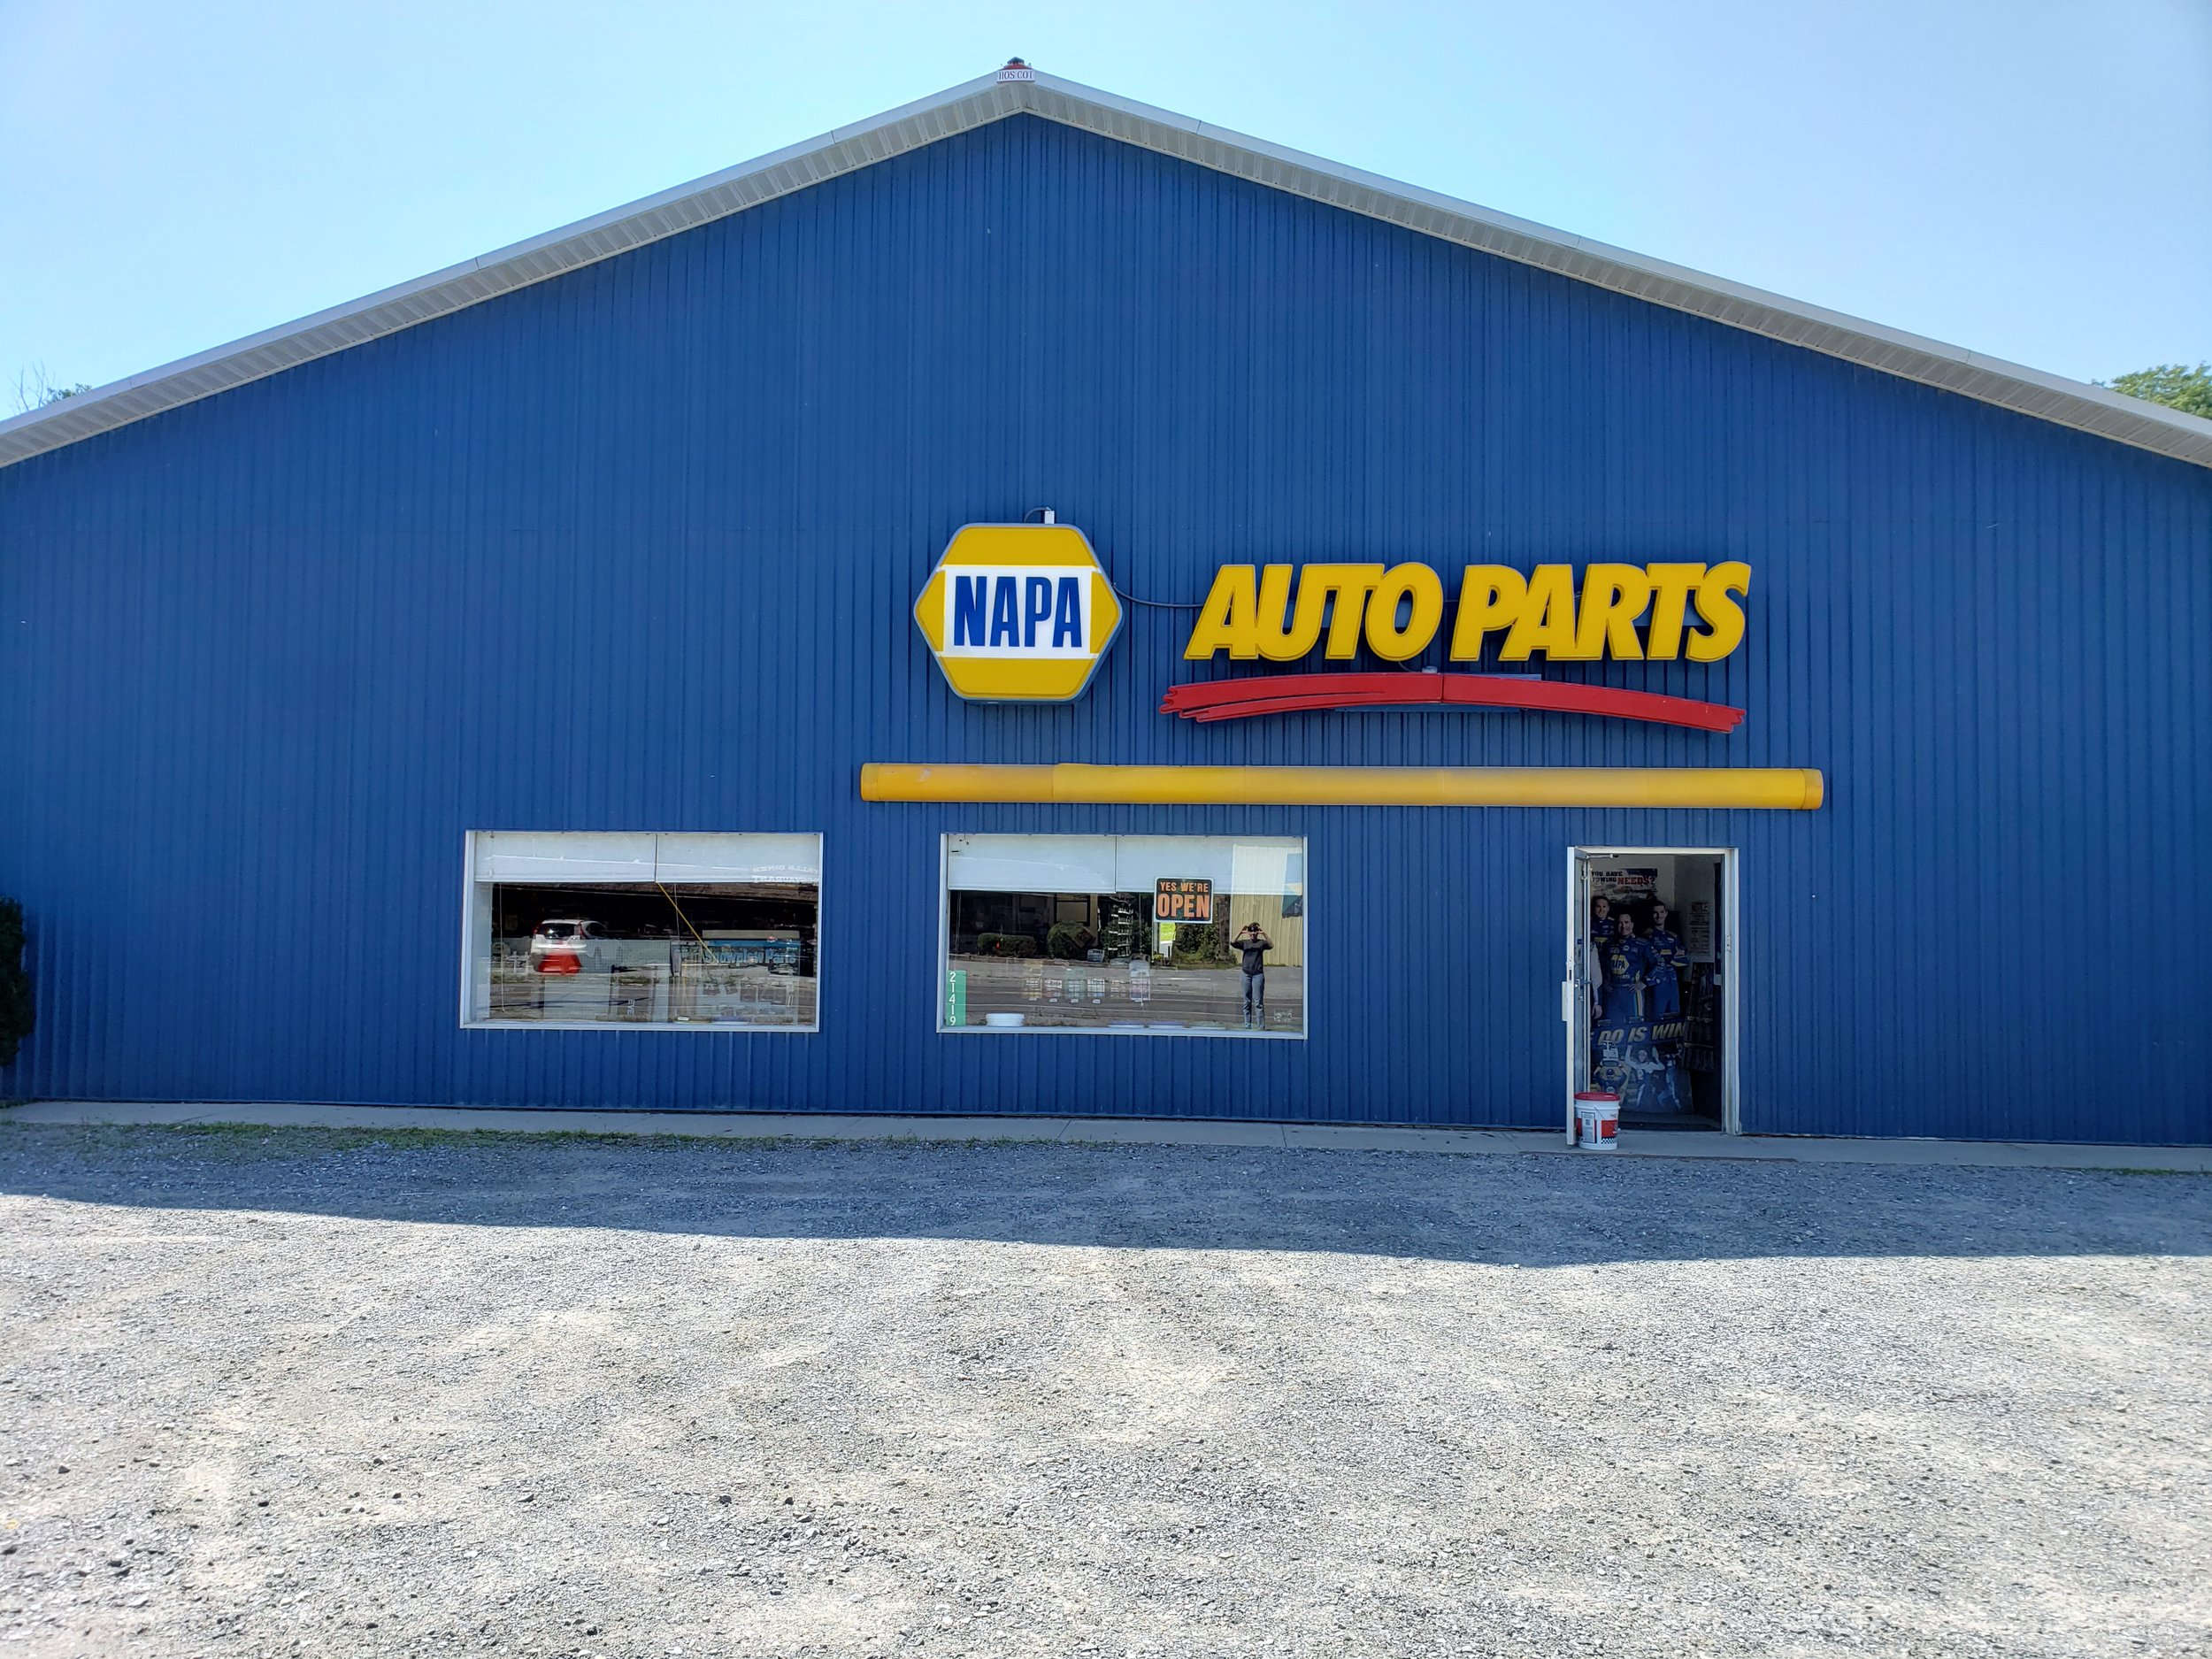 Bob's Auto Parts/NAPA